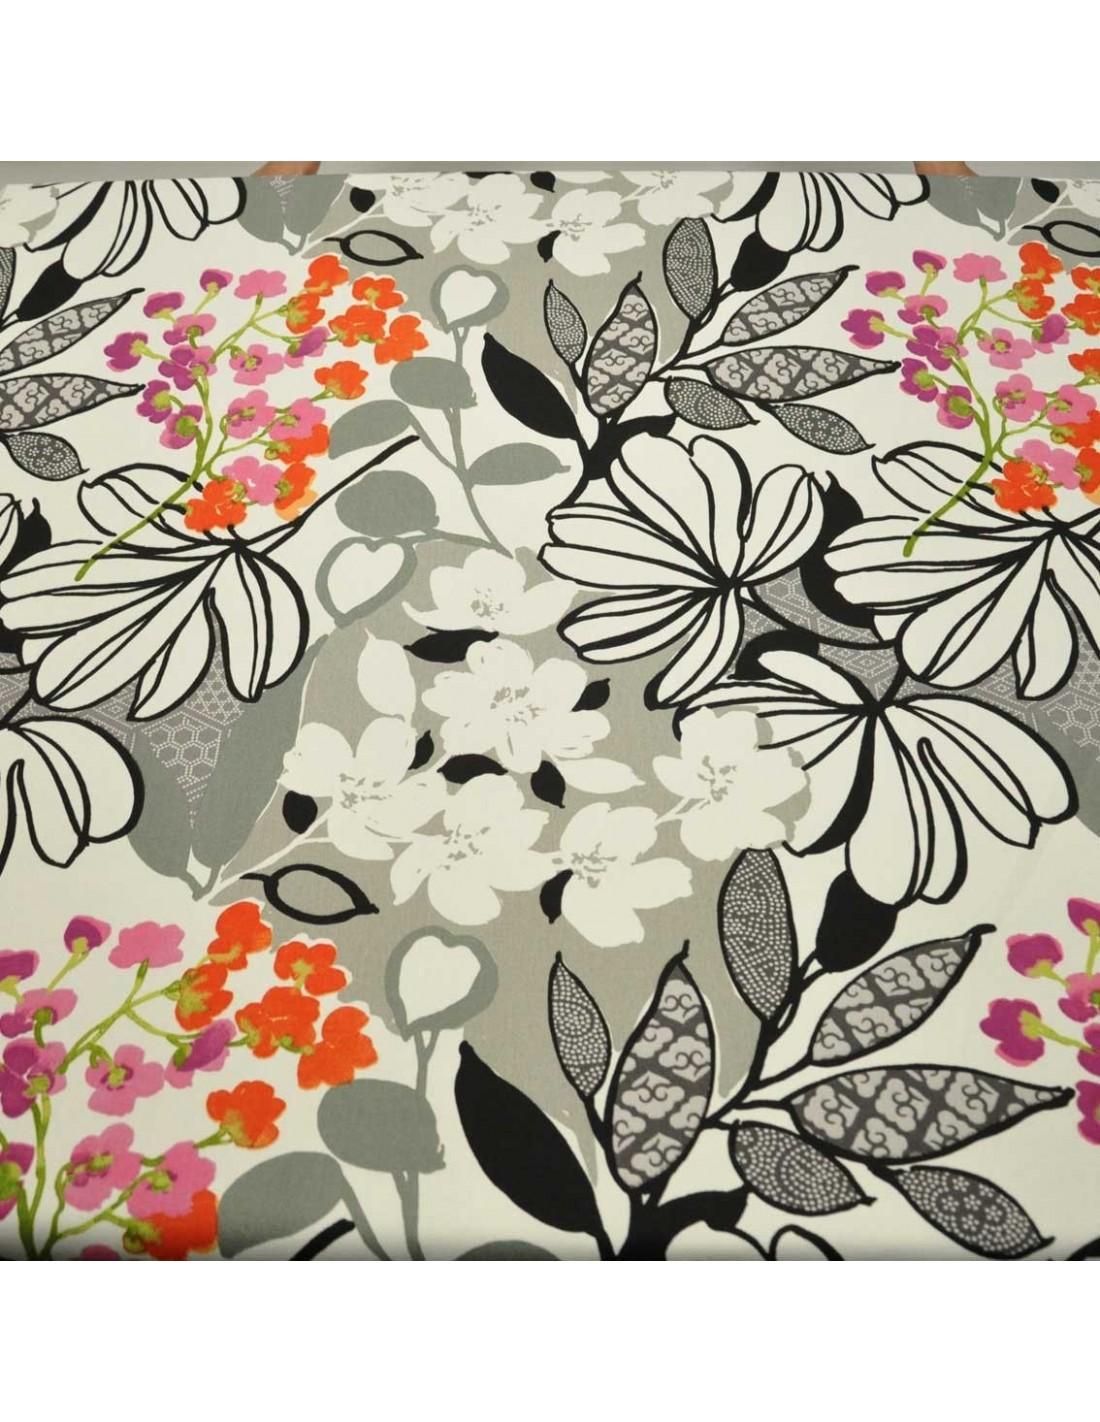 tissus ameublement tissu de d coration chambres. Black Bedroom Furniture Sets. Home Design Ideas